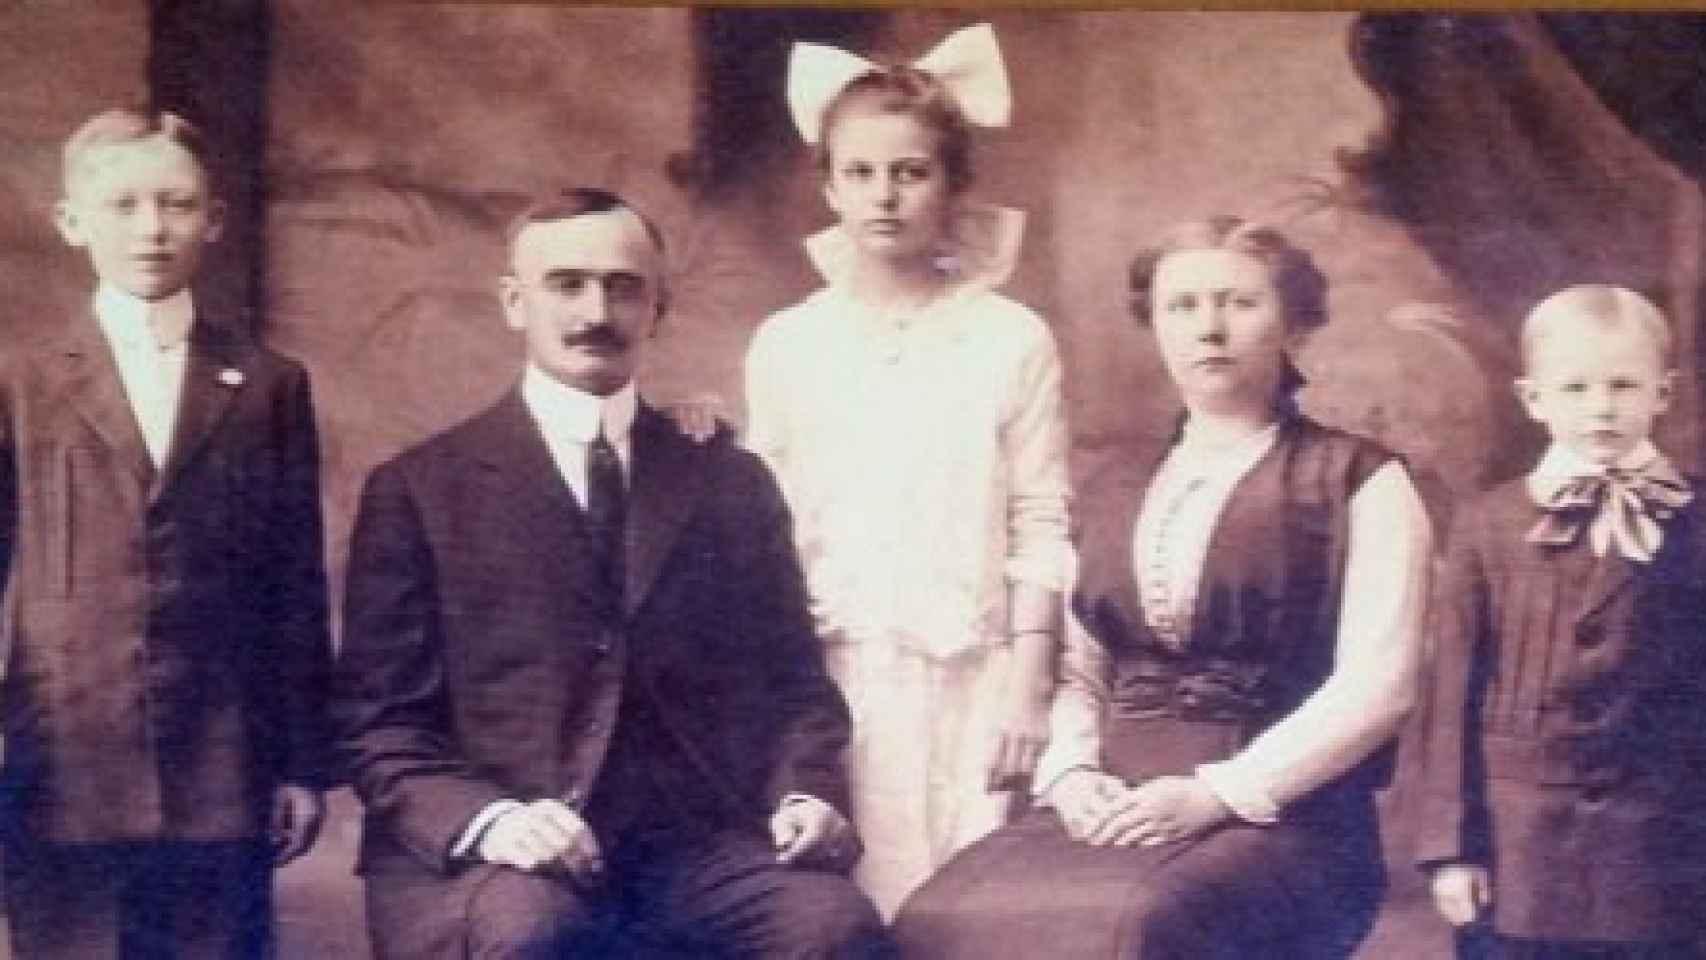 La familia de Friedrich Trump. De izquierda a derecha: Fred (padre de Donald), Friedrich, Elizabeth, Elizabeth Christ (abuela de Donald) y John.